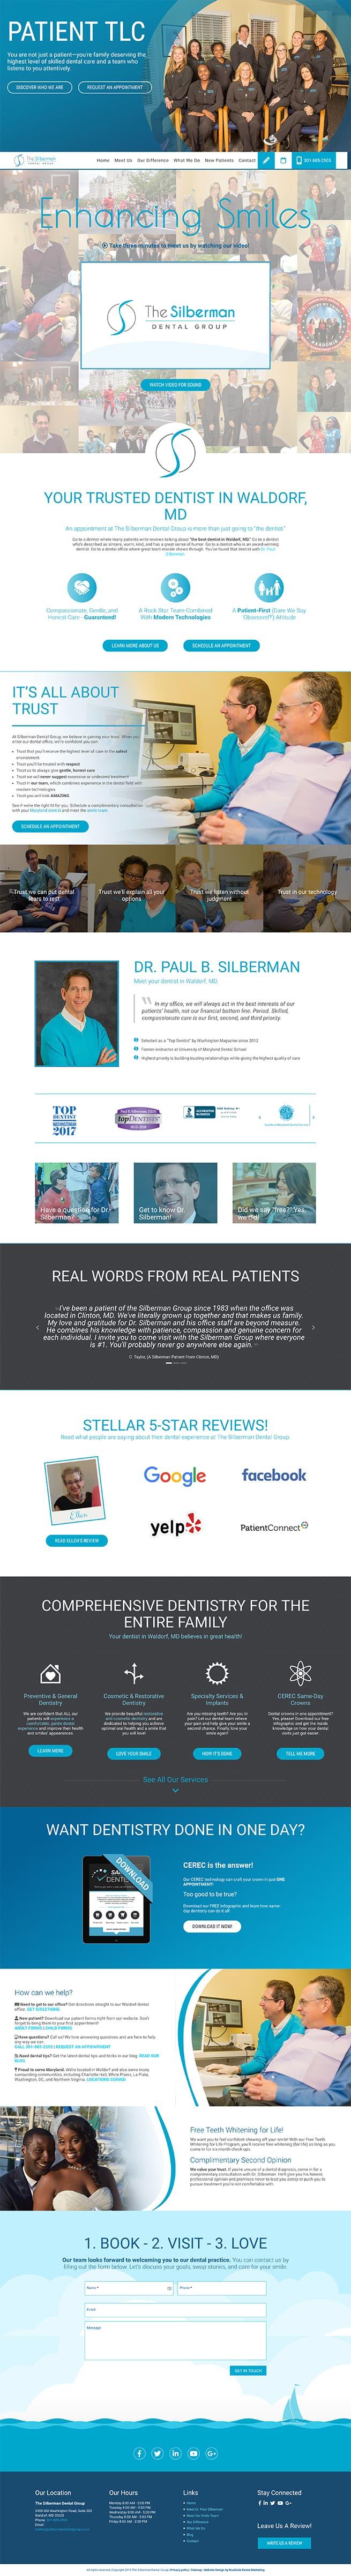 Silberman Dental Group new responsive dental website -desktop version